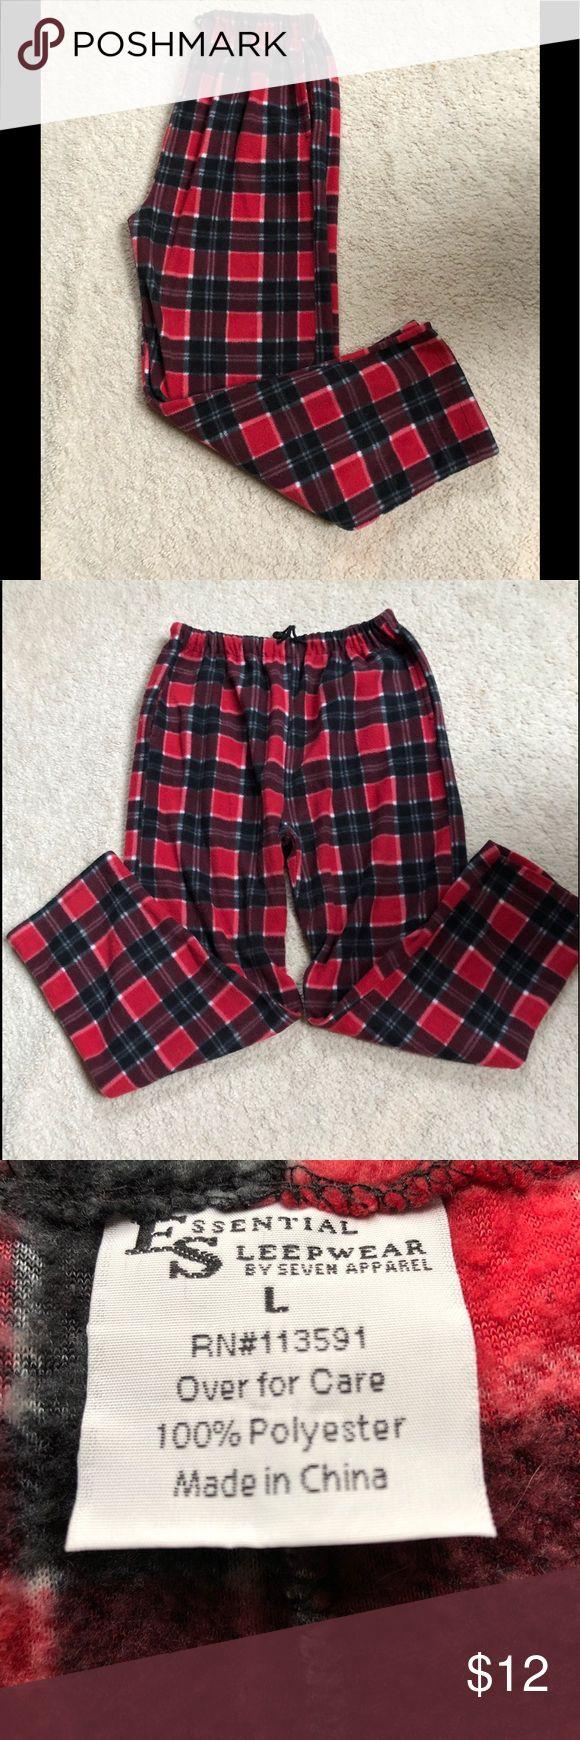 "❄️❄️Fleece Men's Lounge/Sleep Pants❄️❄️ ❄️❄️Fleece Soft , Warm Mens Sleep/ Lounge Pants. Drawstring waist. 2 front slide pockets. Leg inseam 28"".  Colors - red, black, maroon, white and gray plaid. Very good condition!!❄️❄️ Pants Sweatpants & Joggers"